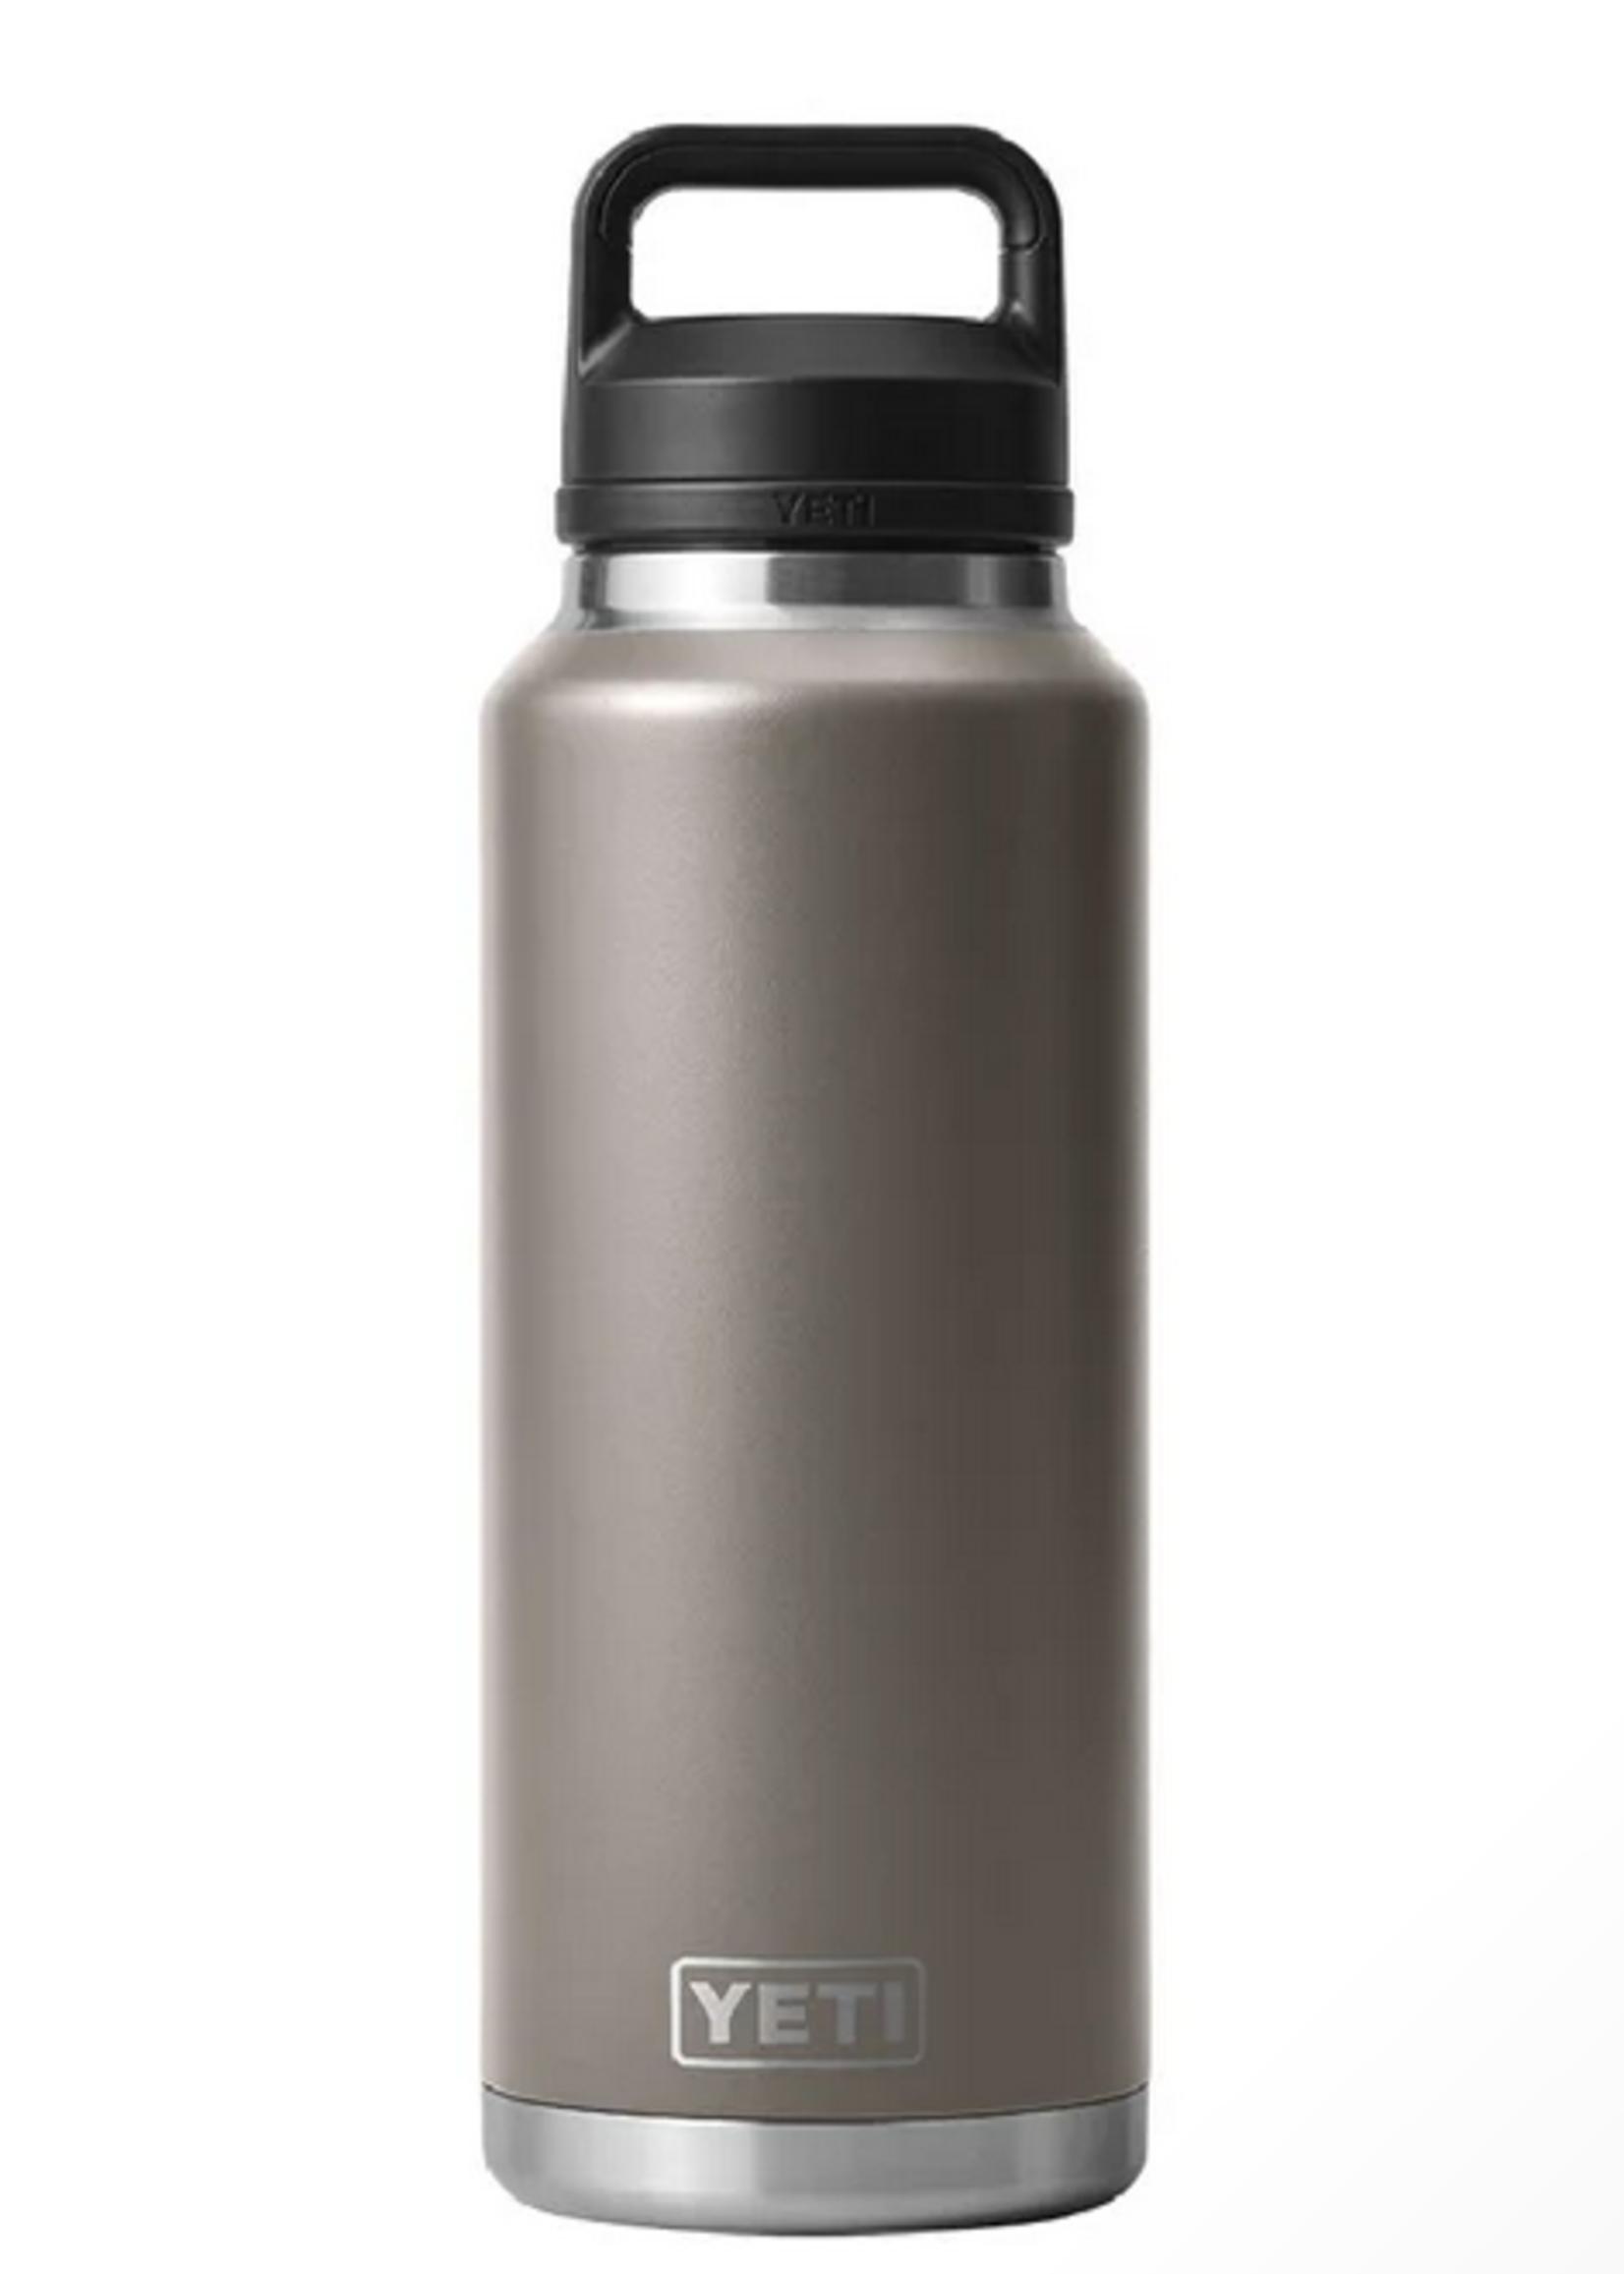 YETI Sharptail Taupe 46 oz Bottle Cug